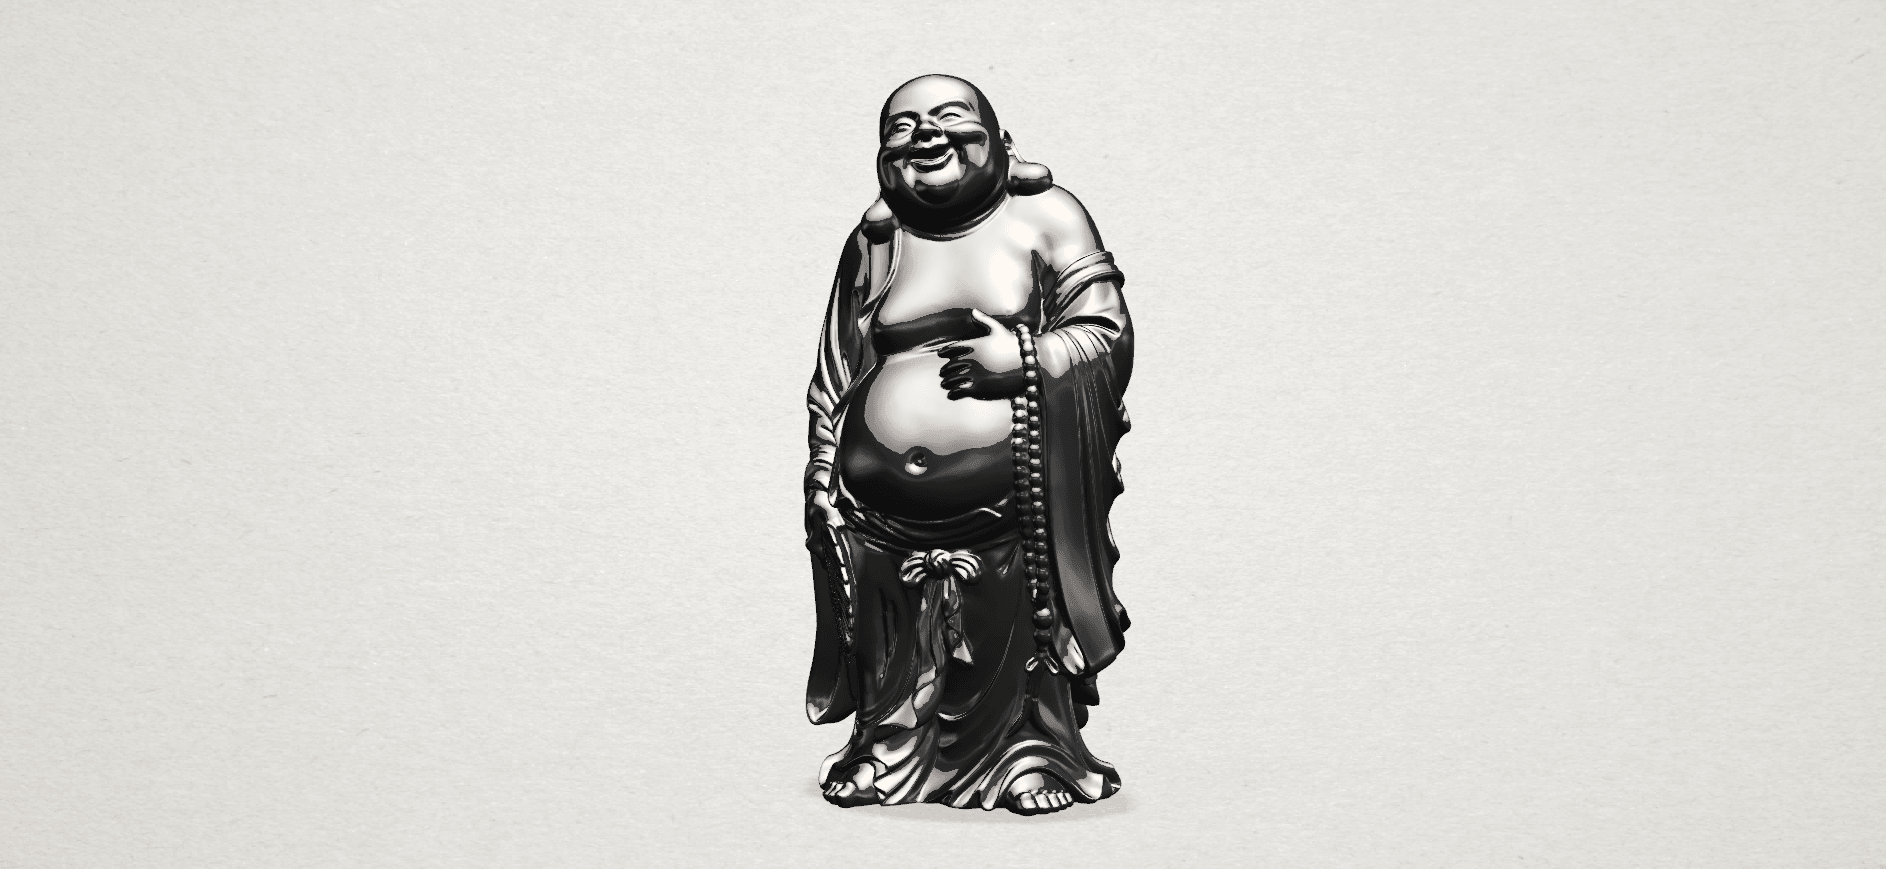 TDA0070 Metteyya Buddha 01 - 88mm - B01.png Download free STL file Metteyya Buddha 01 • 3D print object, GeorgesNikkei